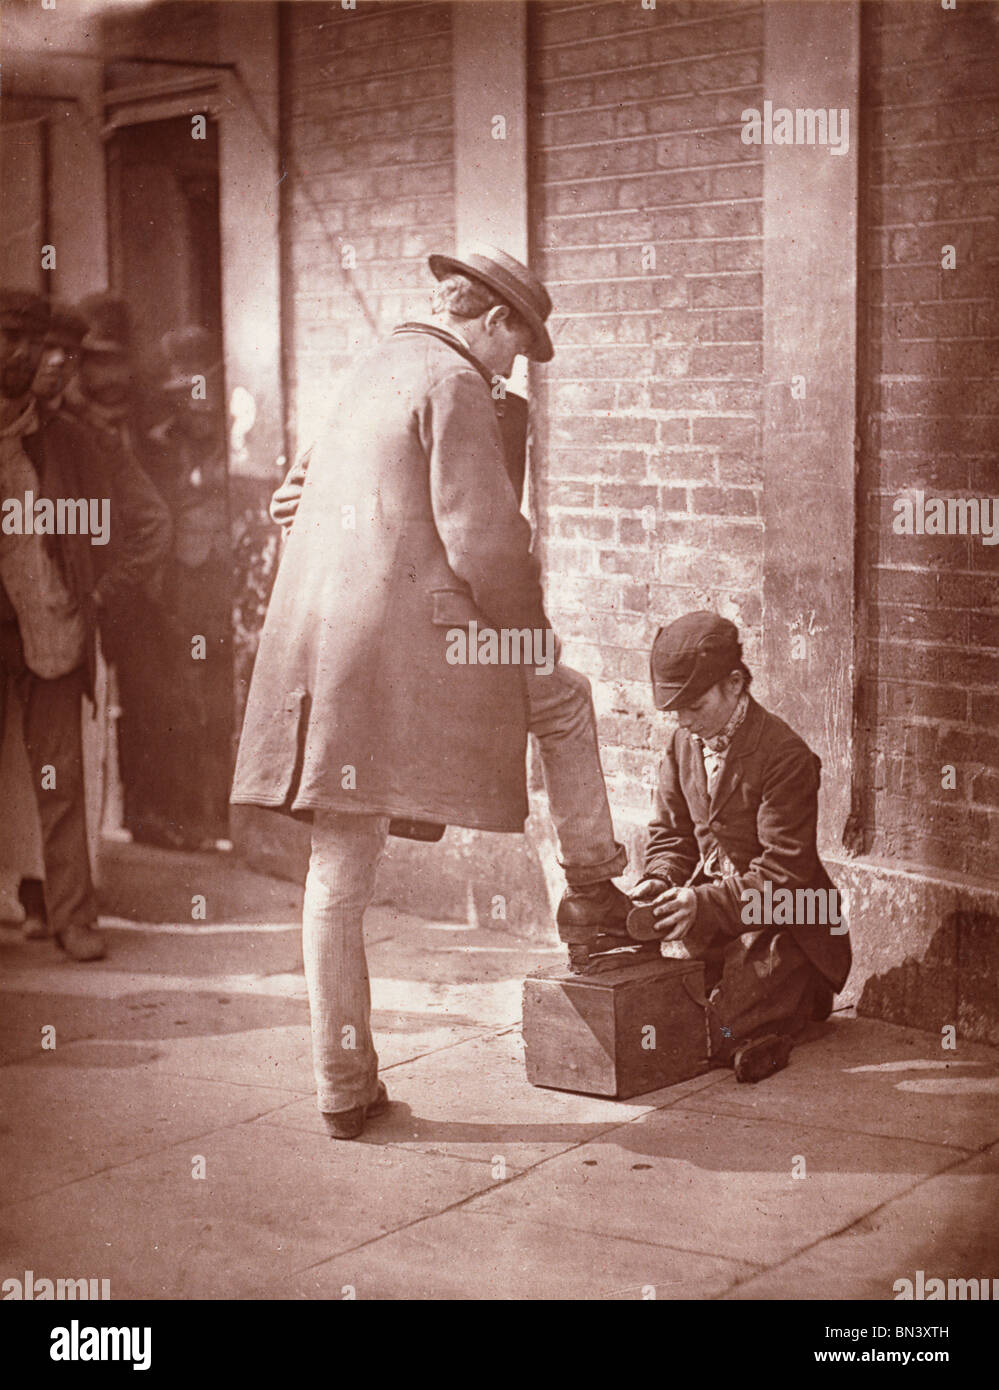 The Dramatic Shoe-Black, by John Thomson. London, England, late 19th century Stock Photo